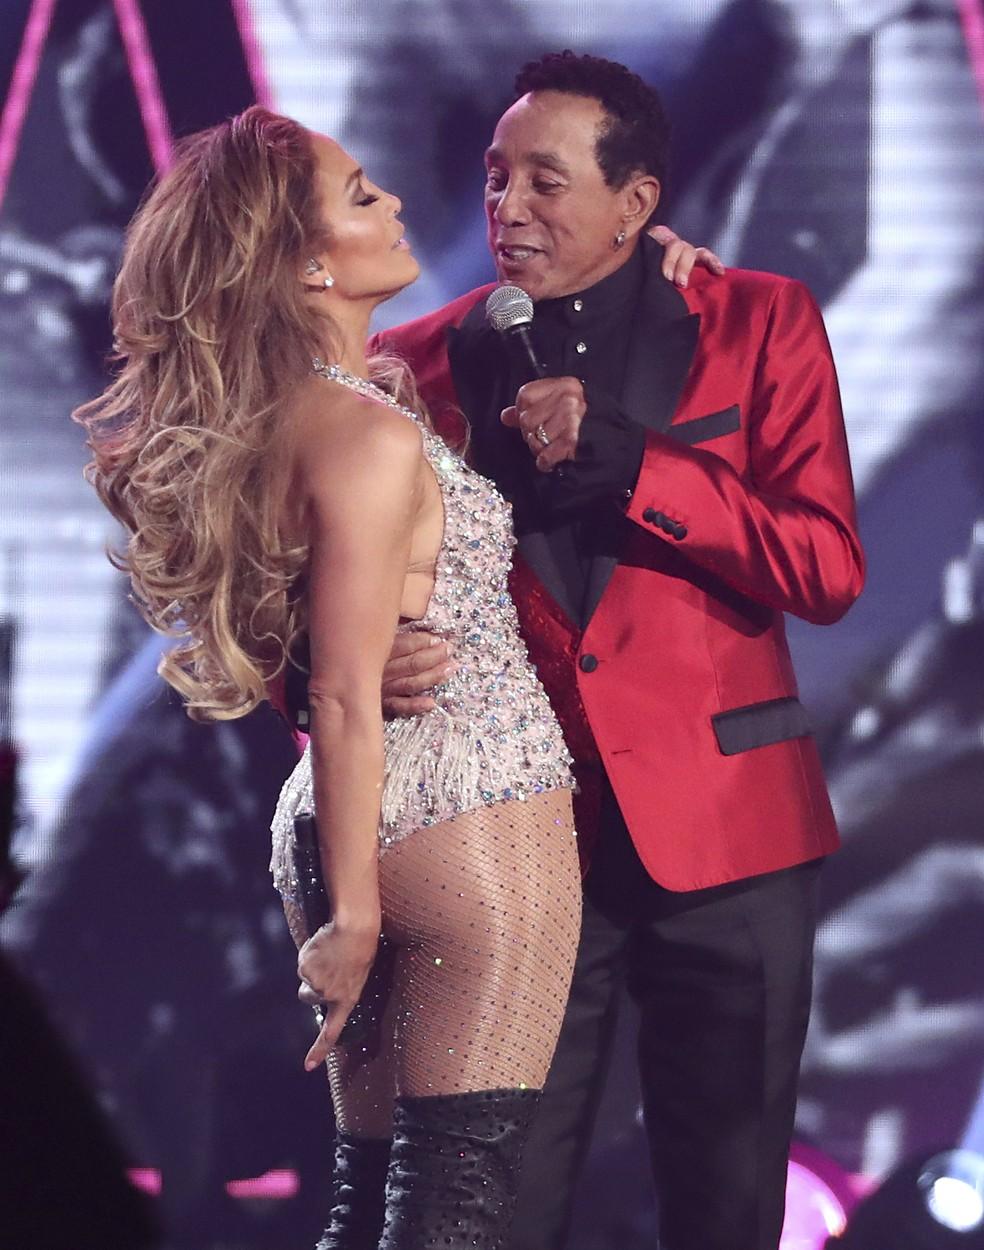 Jennifer Lopez e Smokey Robinson se apresentam durante o Grammy 2019, em Los Angeles — Foto: Matt Sayles/Invision/AP